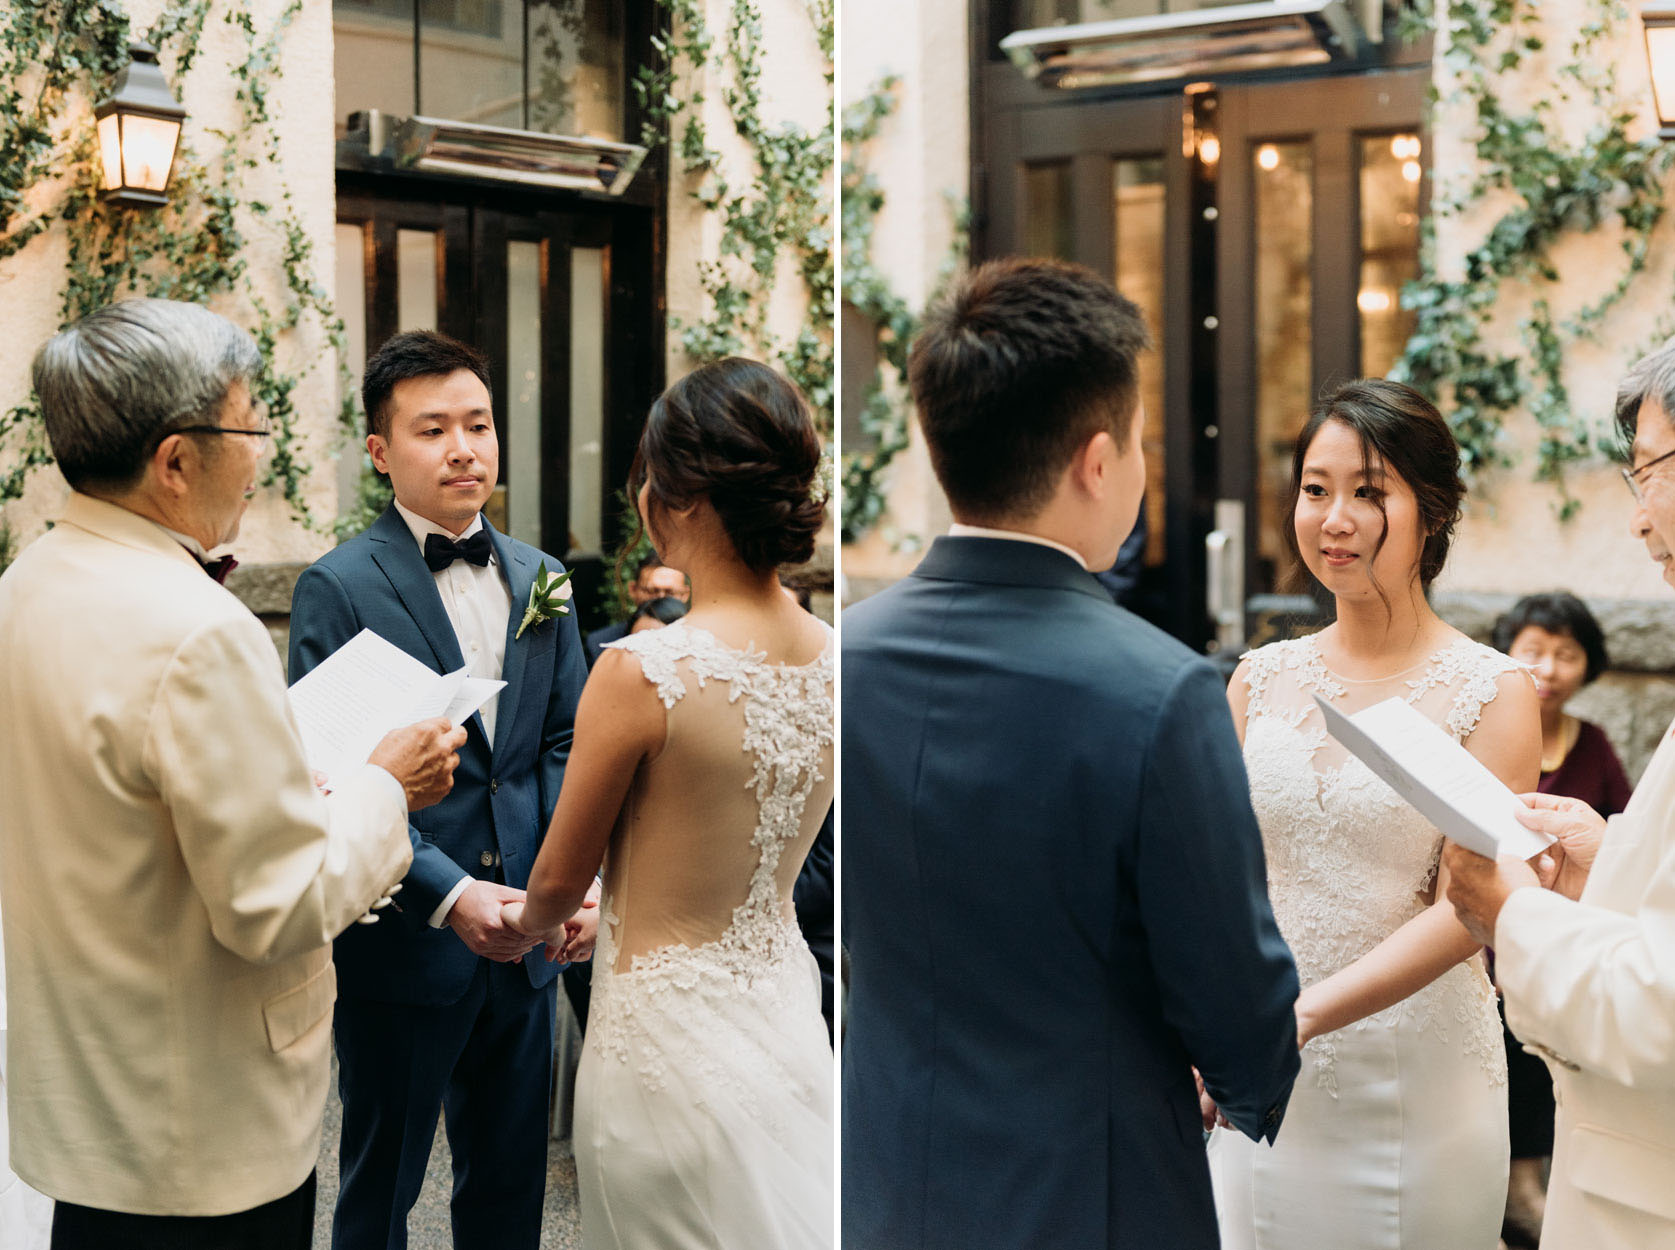 yaletown-wedding-21.jpg